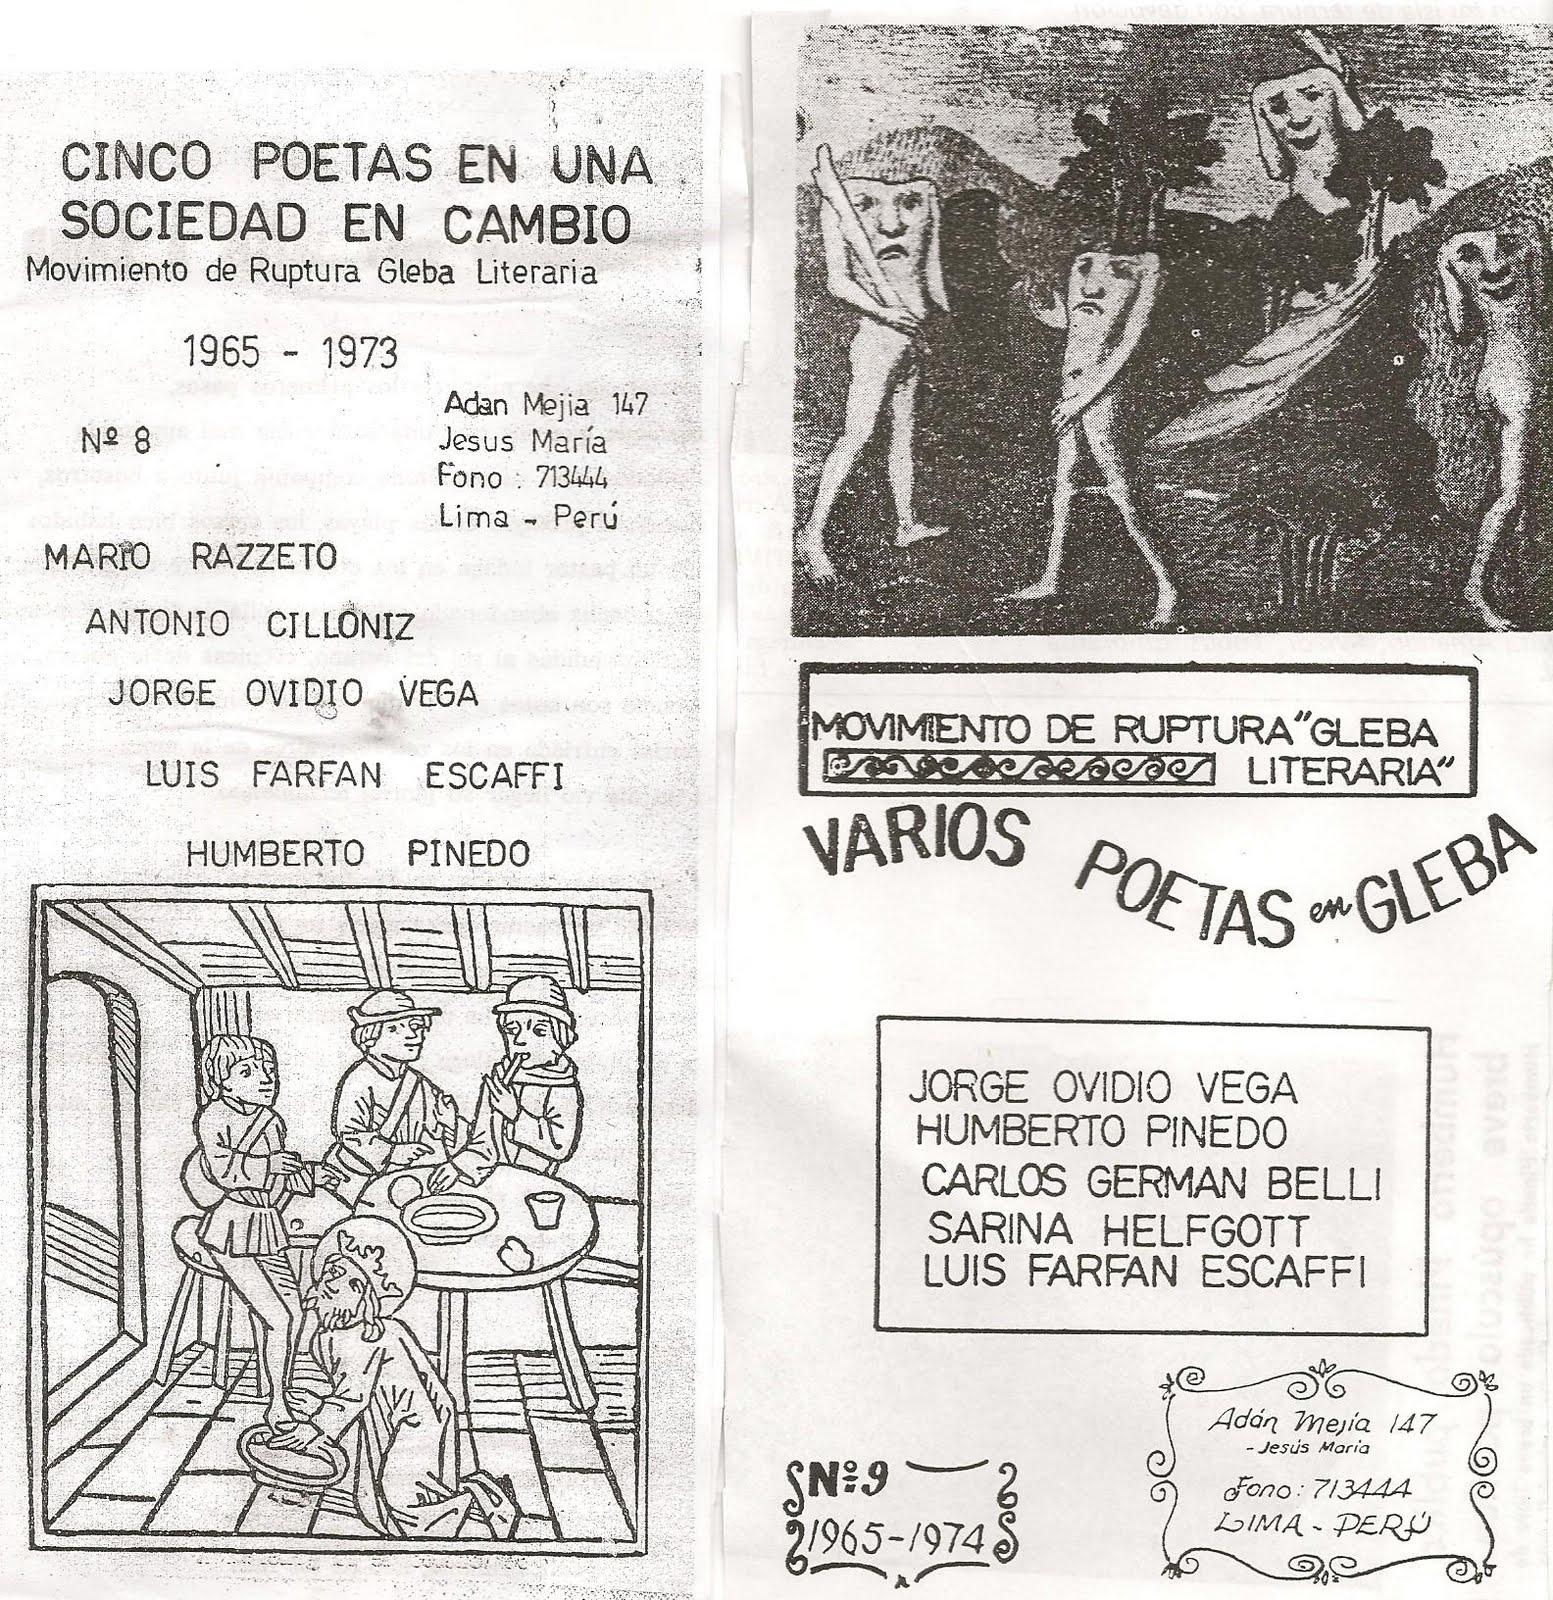 humberto pinedo mendoza la primera publicacion de gleba literaria fue ...